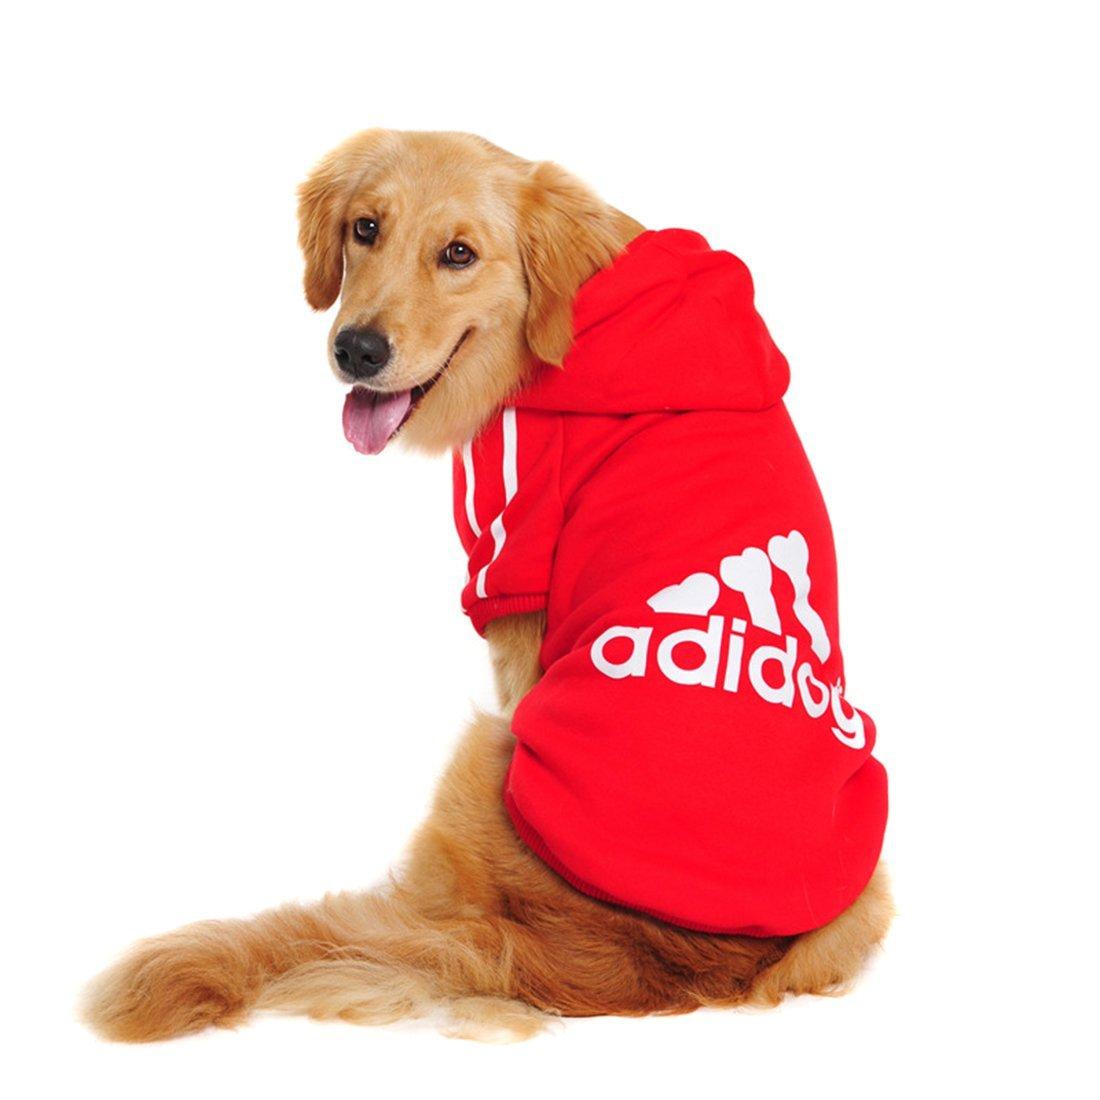 Gran Perro ropa de invierno cálido abrigo chaqueta ropa para perros de gran tamaño Golden Retriever Labrador 3XL-9XL Adidog Sudadera con capucha